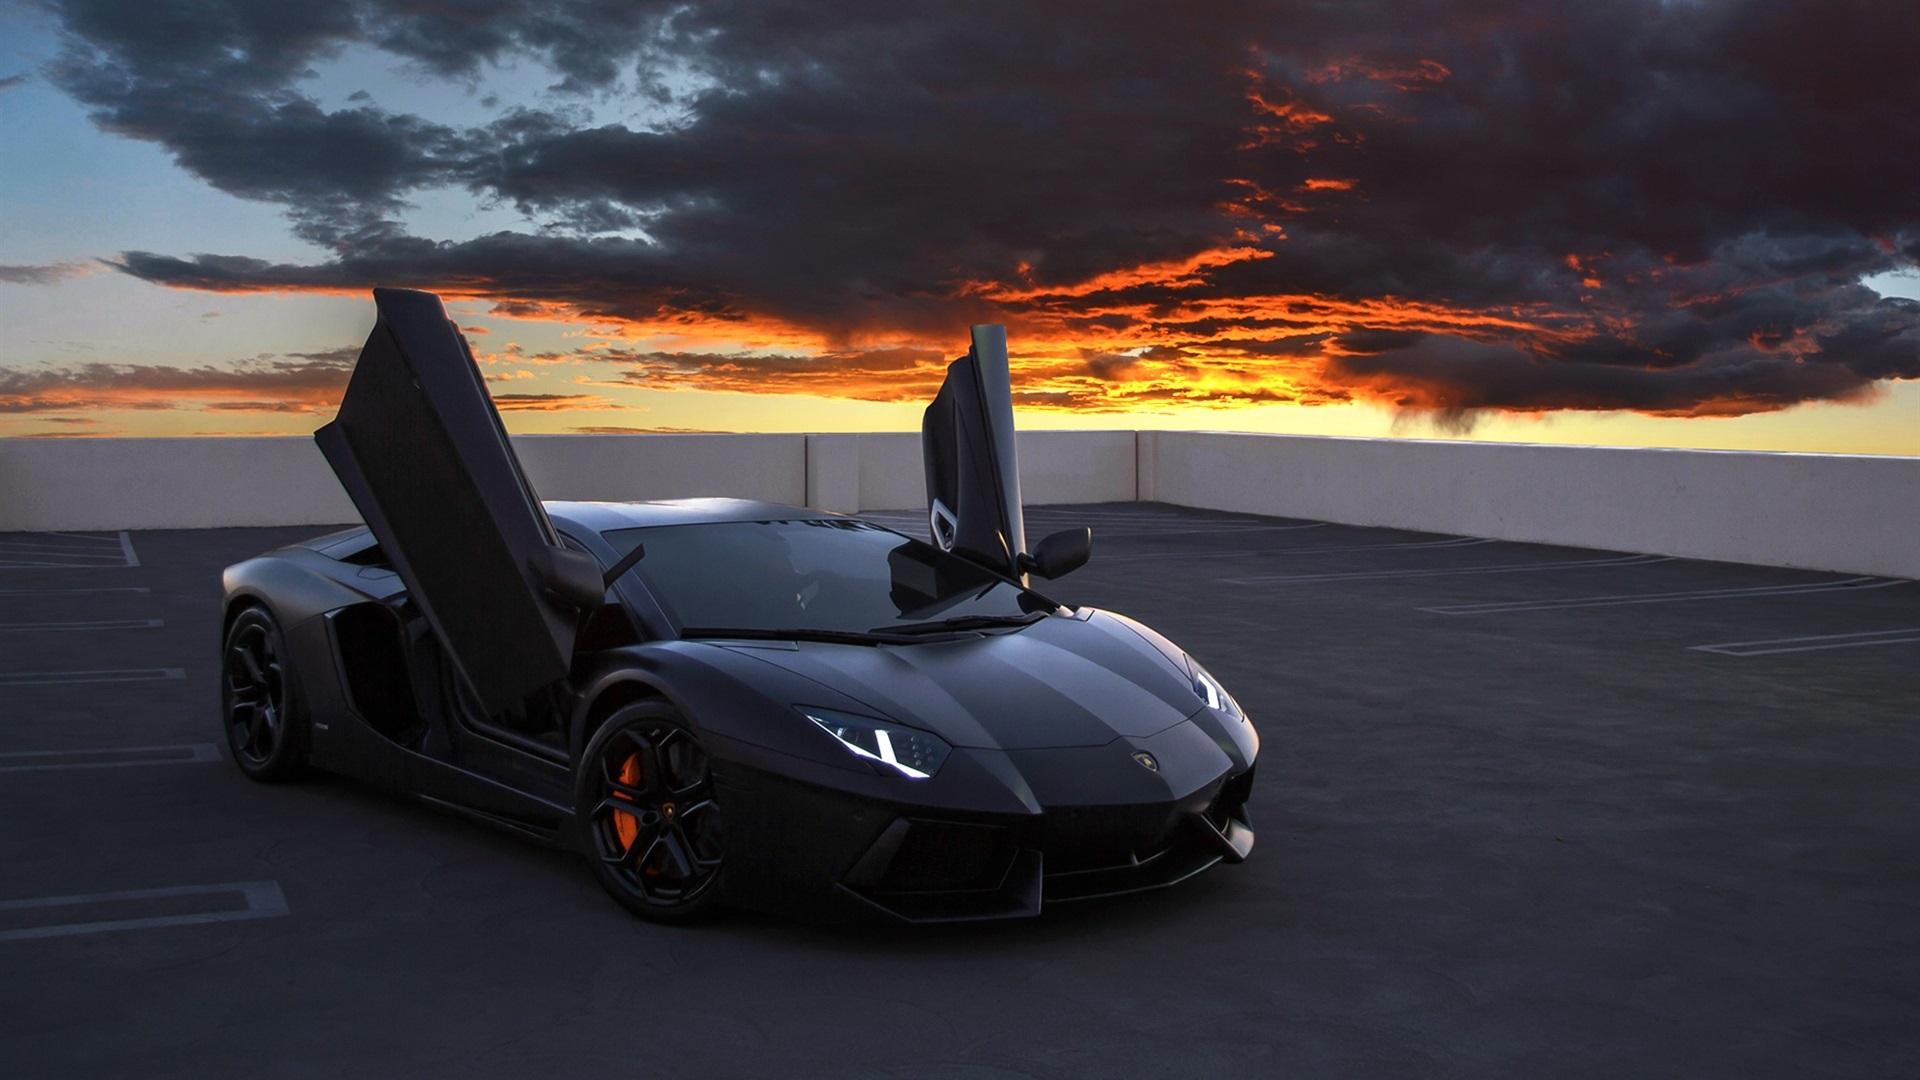 Lamborghini Fondos De Pantalla Hd >> superdeportivo Lamborghini Aventador, sobre las azoteas, cielo rojo, nubes Fondos de pantalla ...